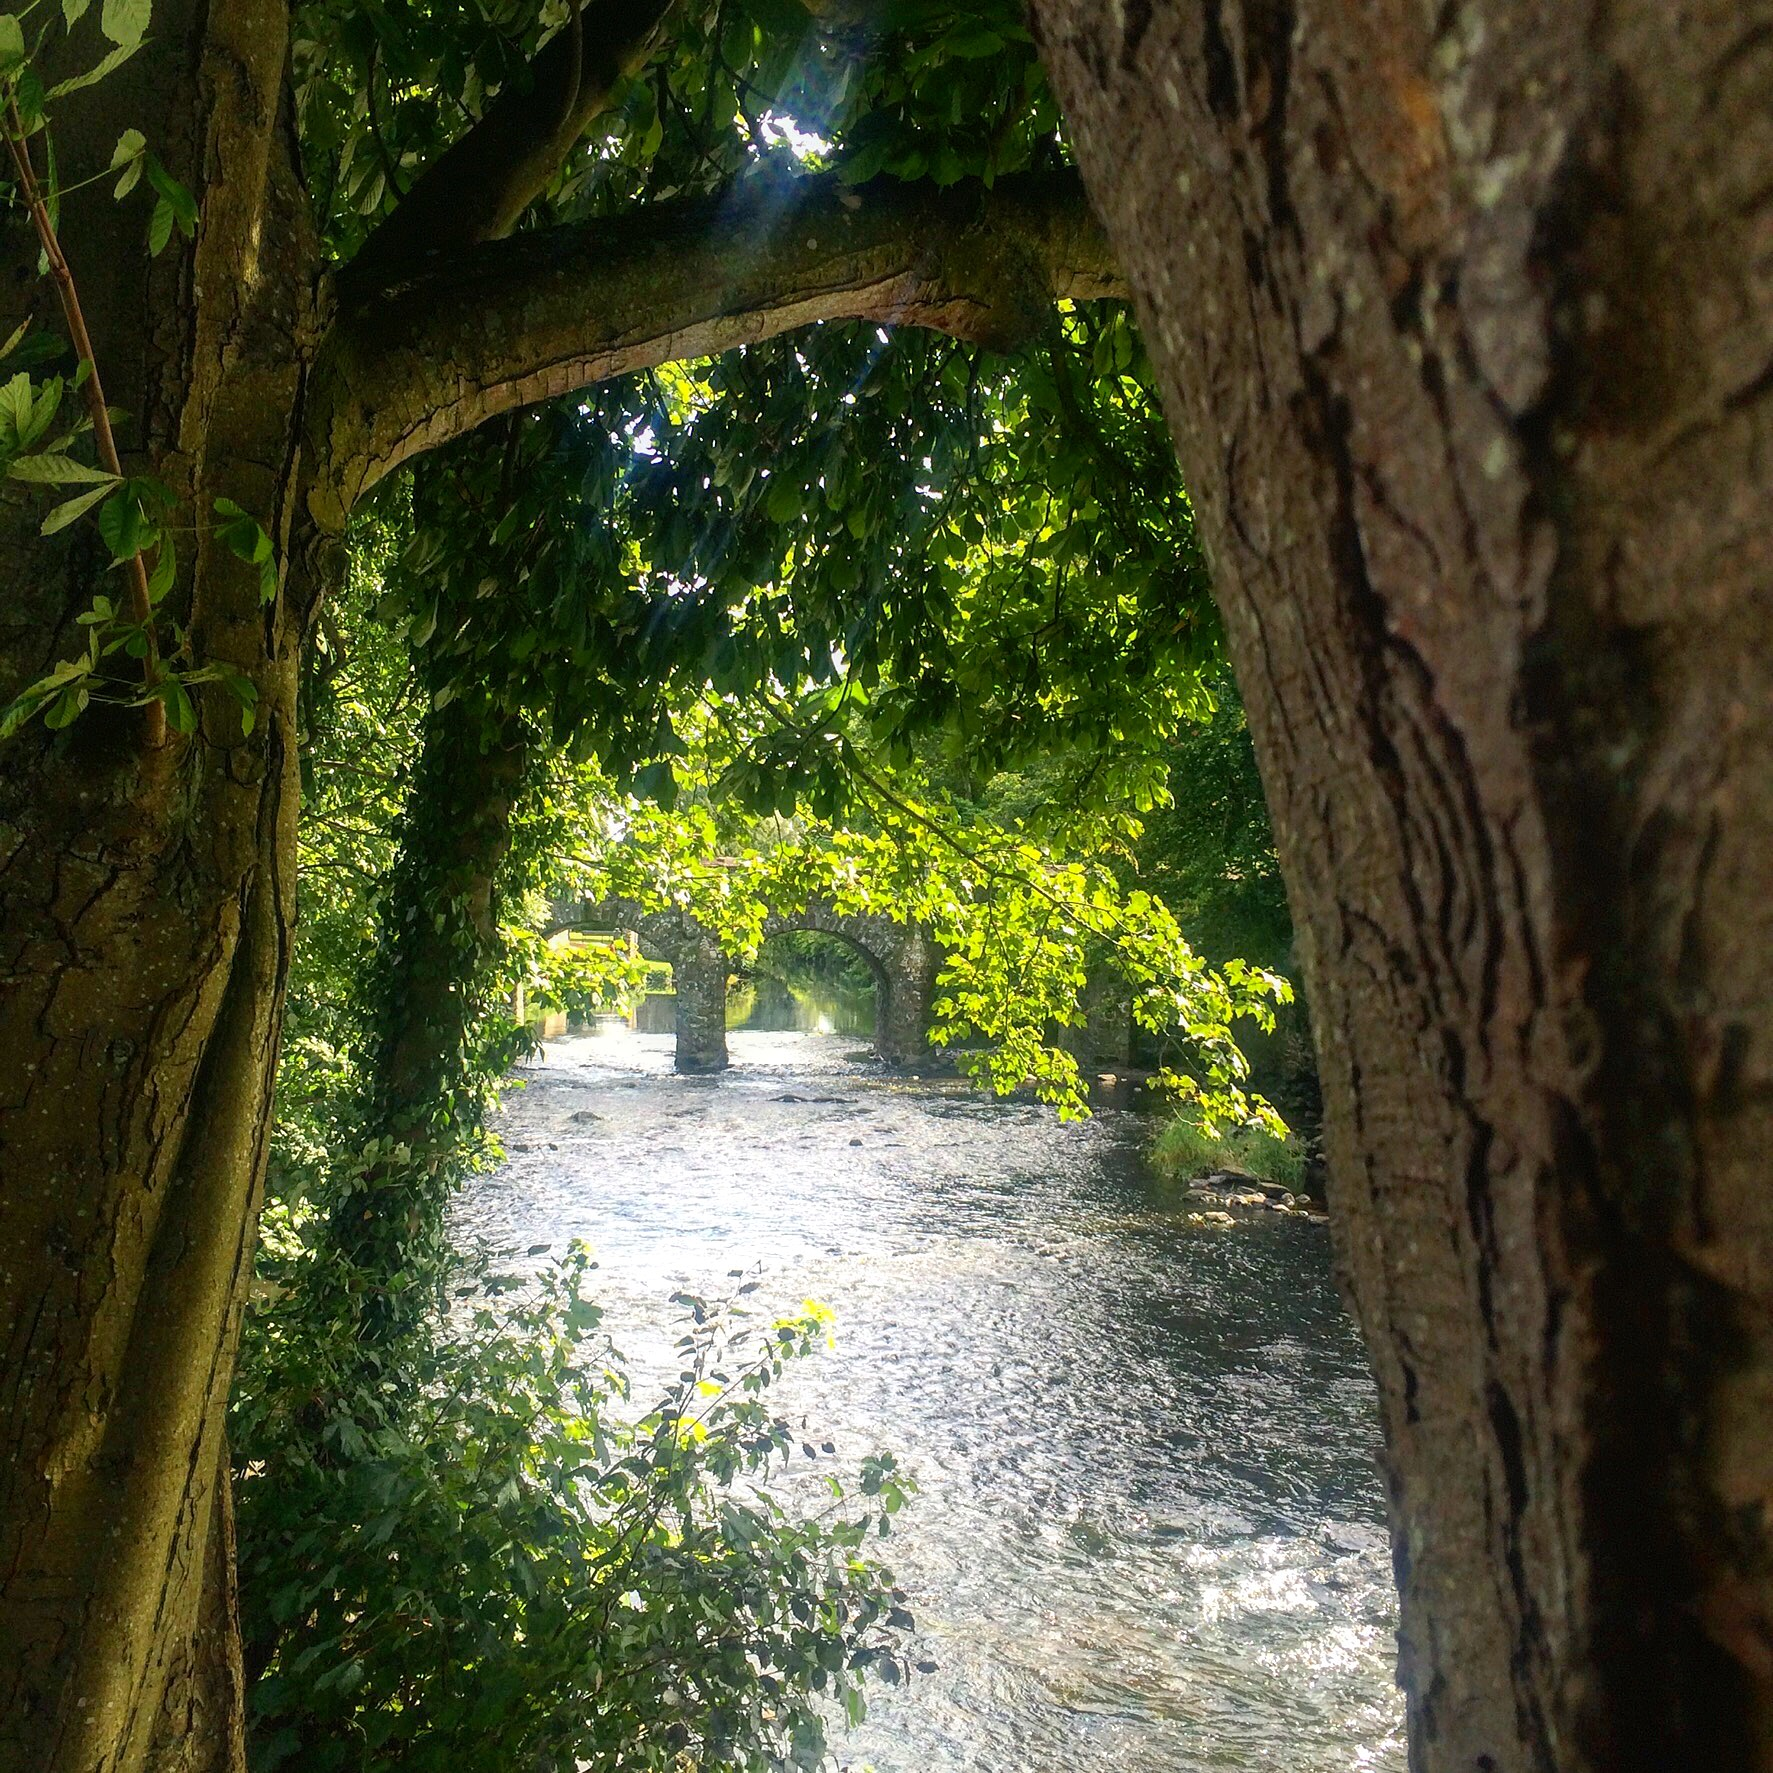 antrim_castle_walled_garden_lough_neagh_northern_ireland_ni_explorer_niexplorer (1)